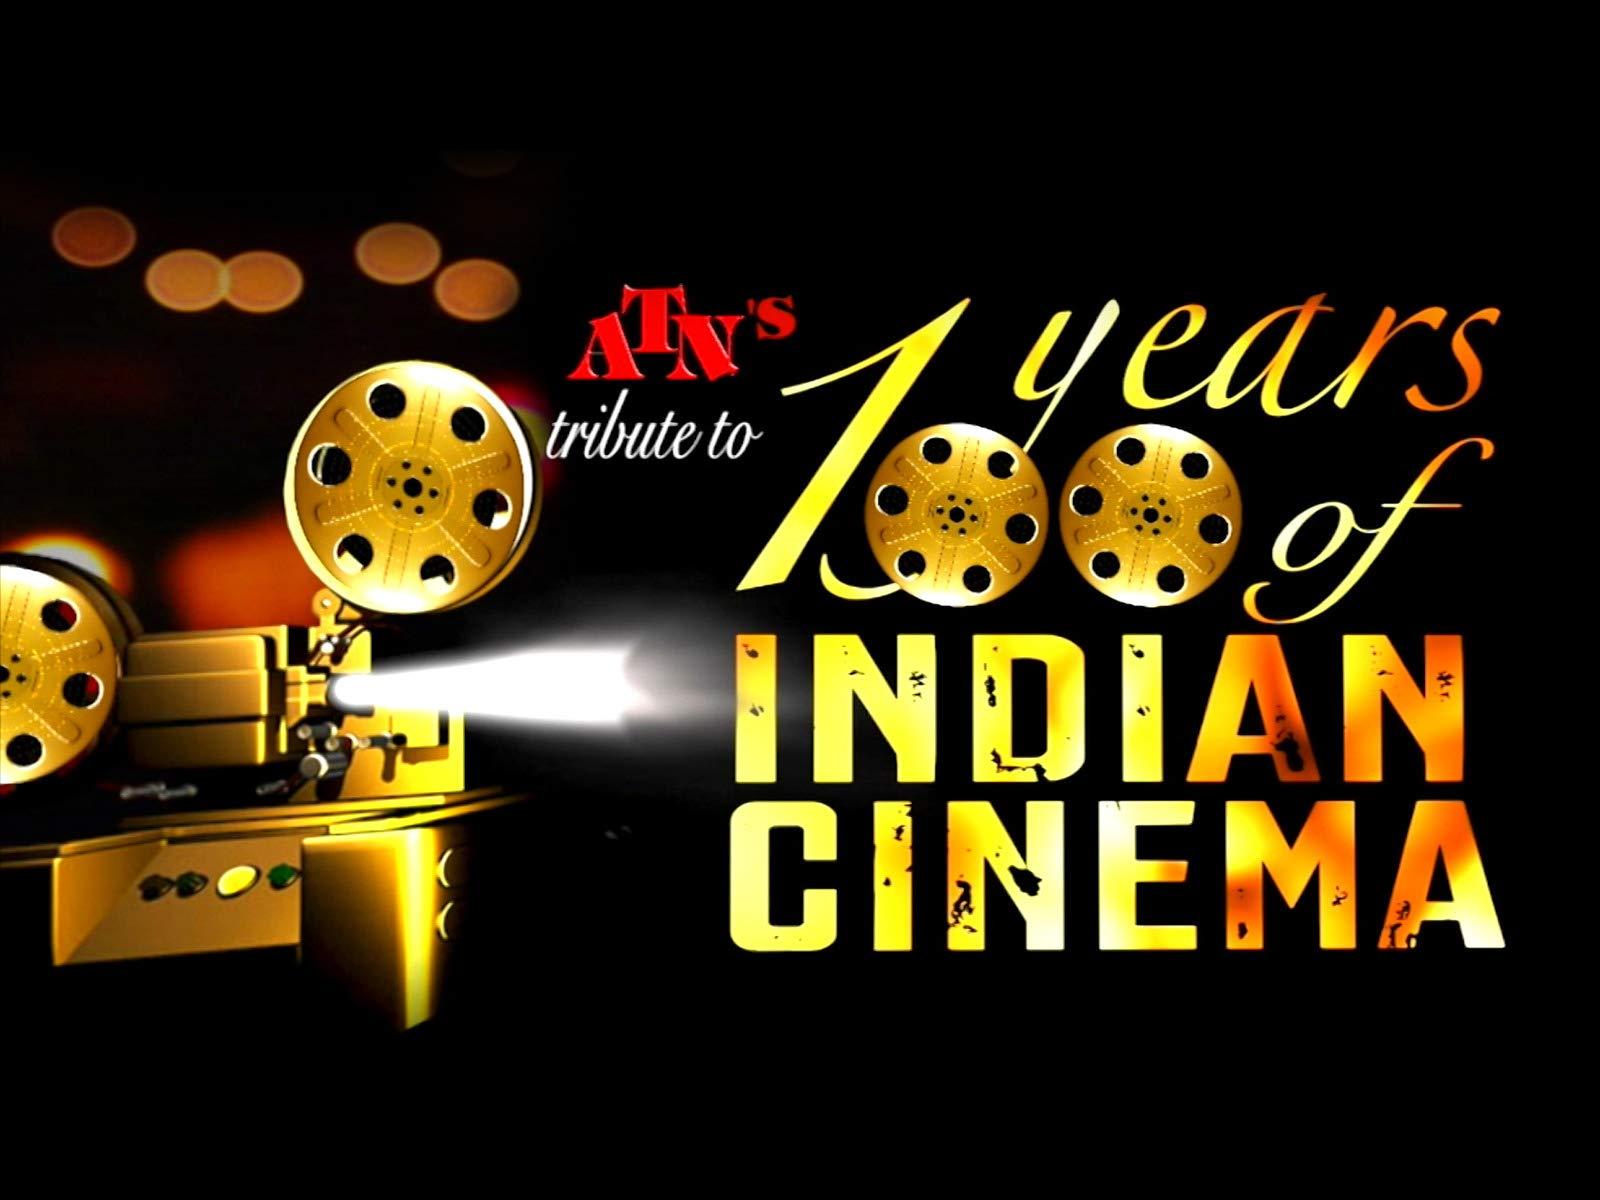 ATN's Tribute to 100 Years of Indian Cinema - Season 15